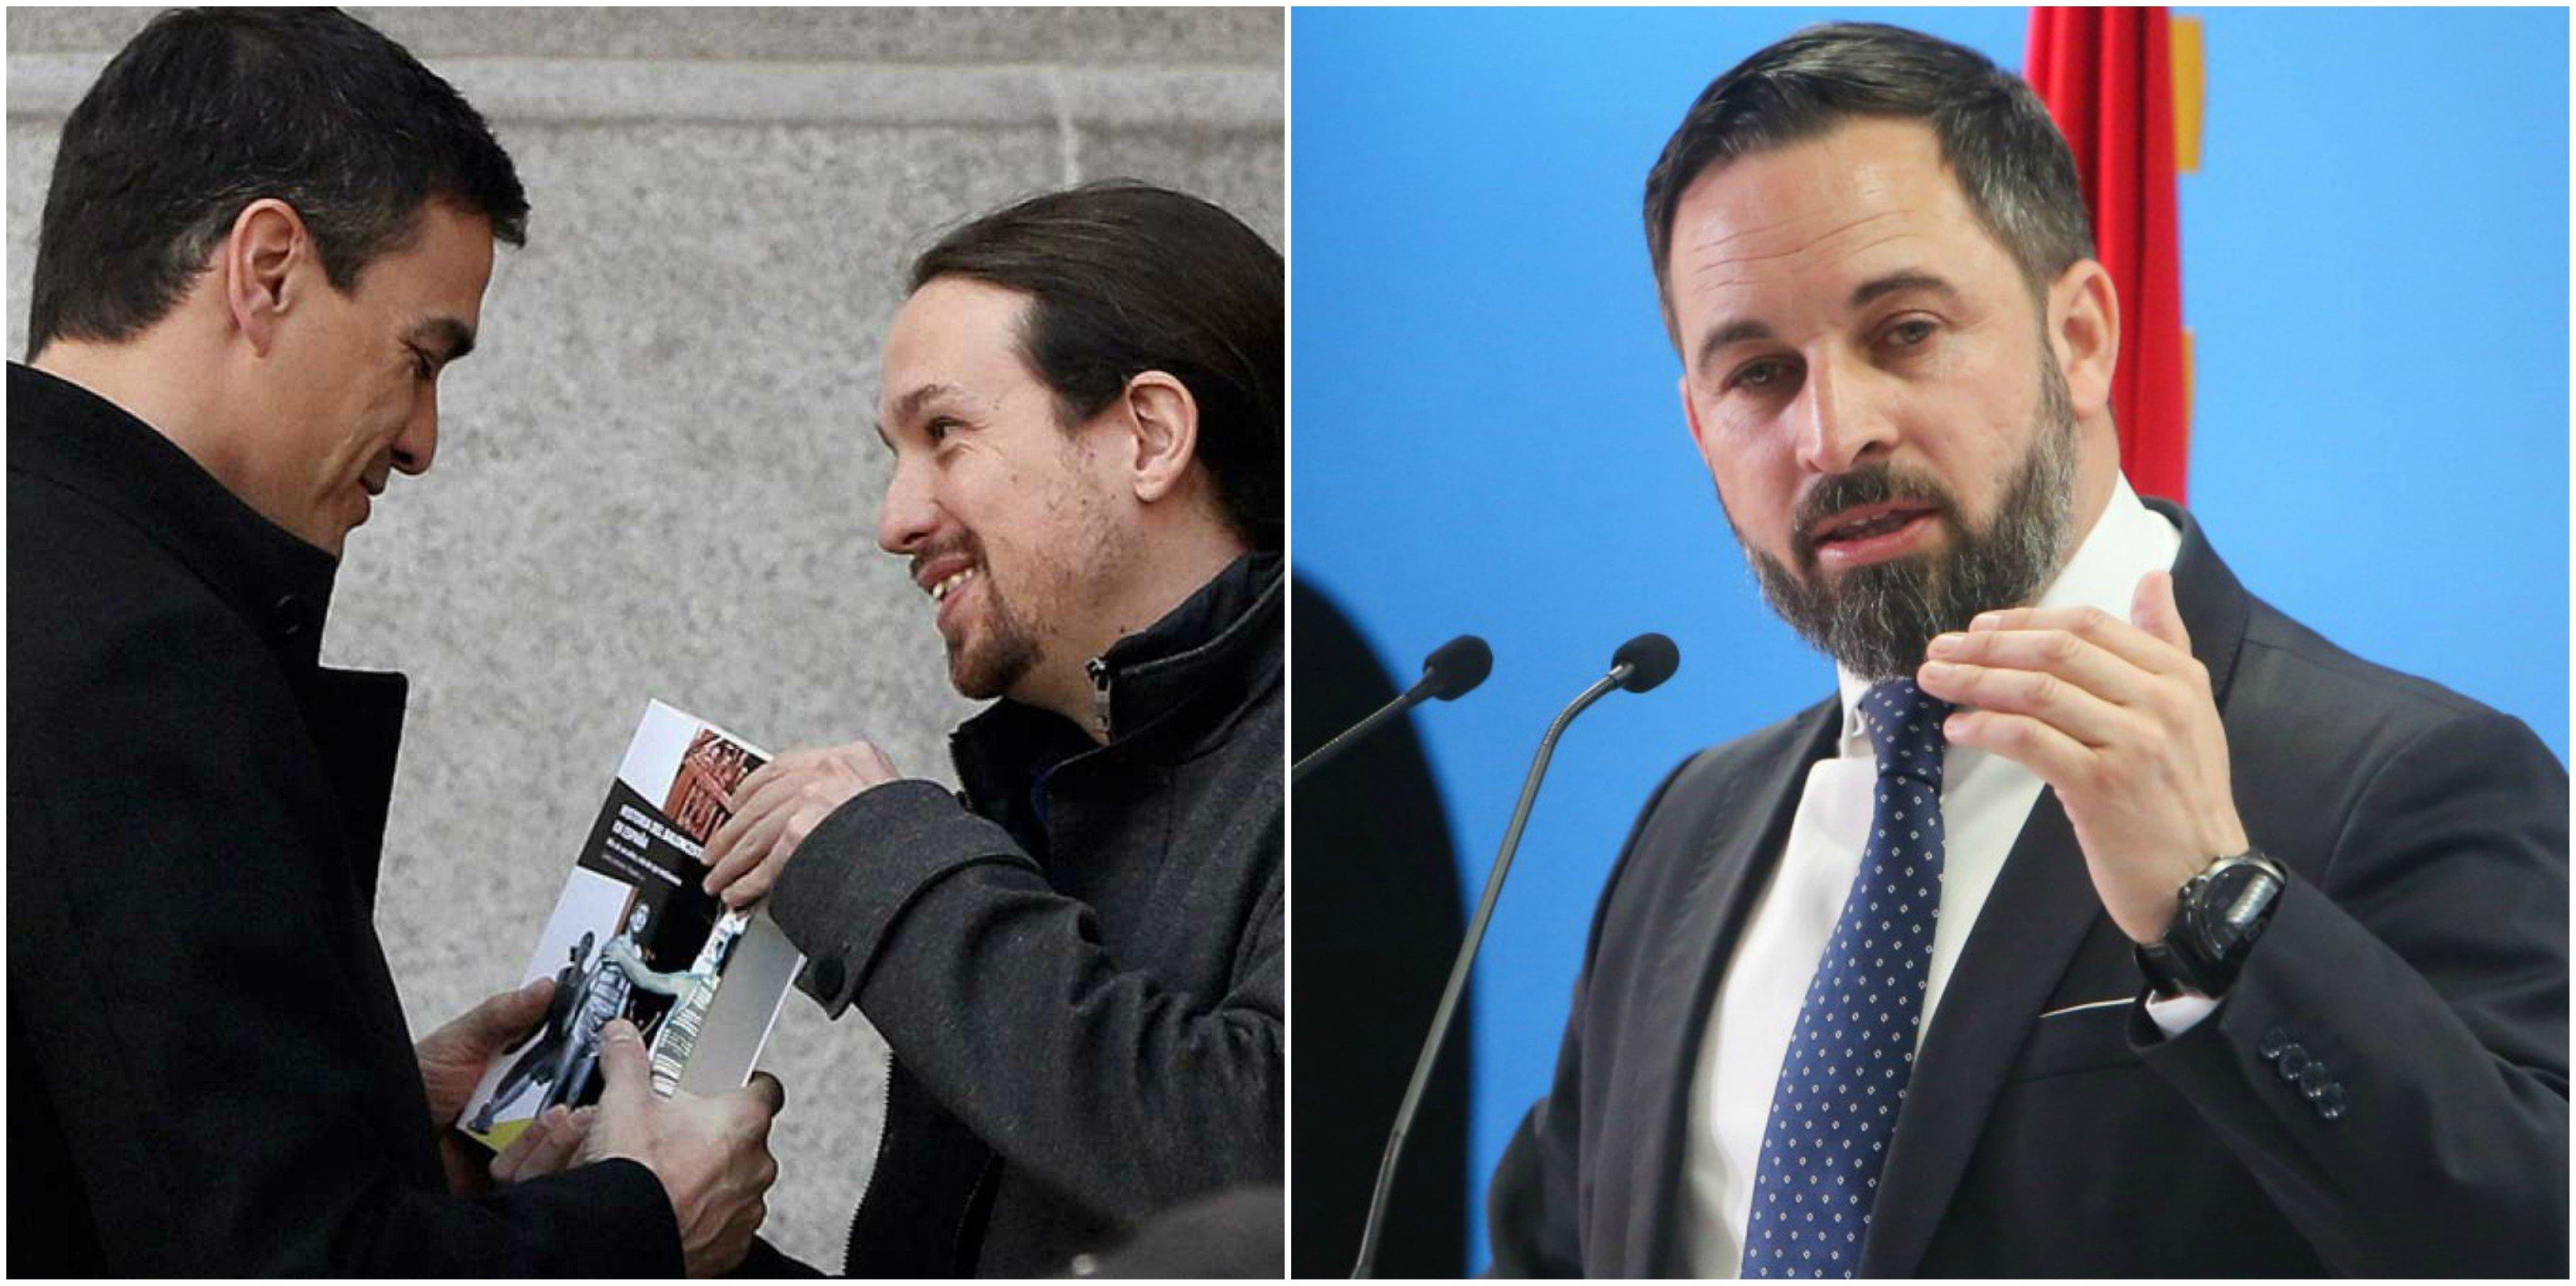 Moncloa propone un gran pacto nacional… sin Vox, al que se pretende ilegalizar